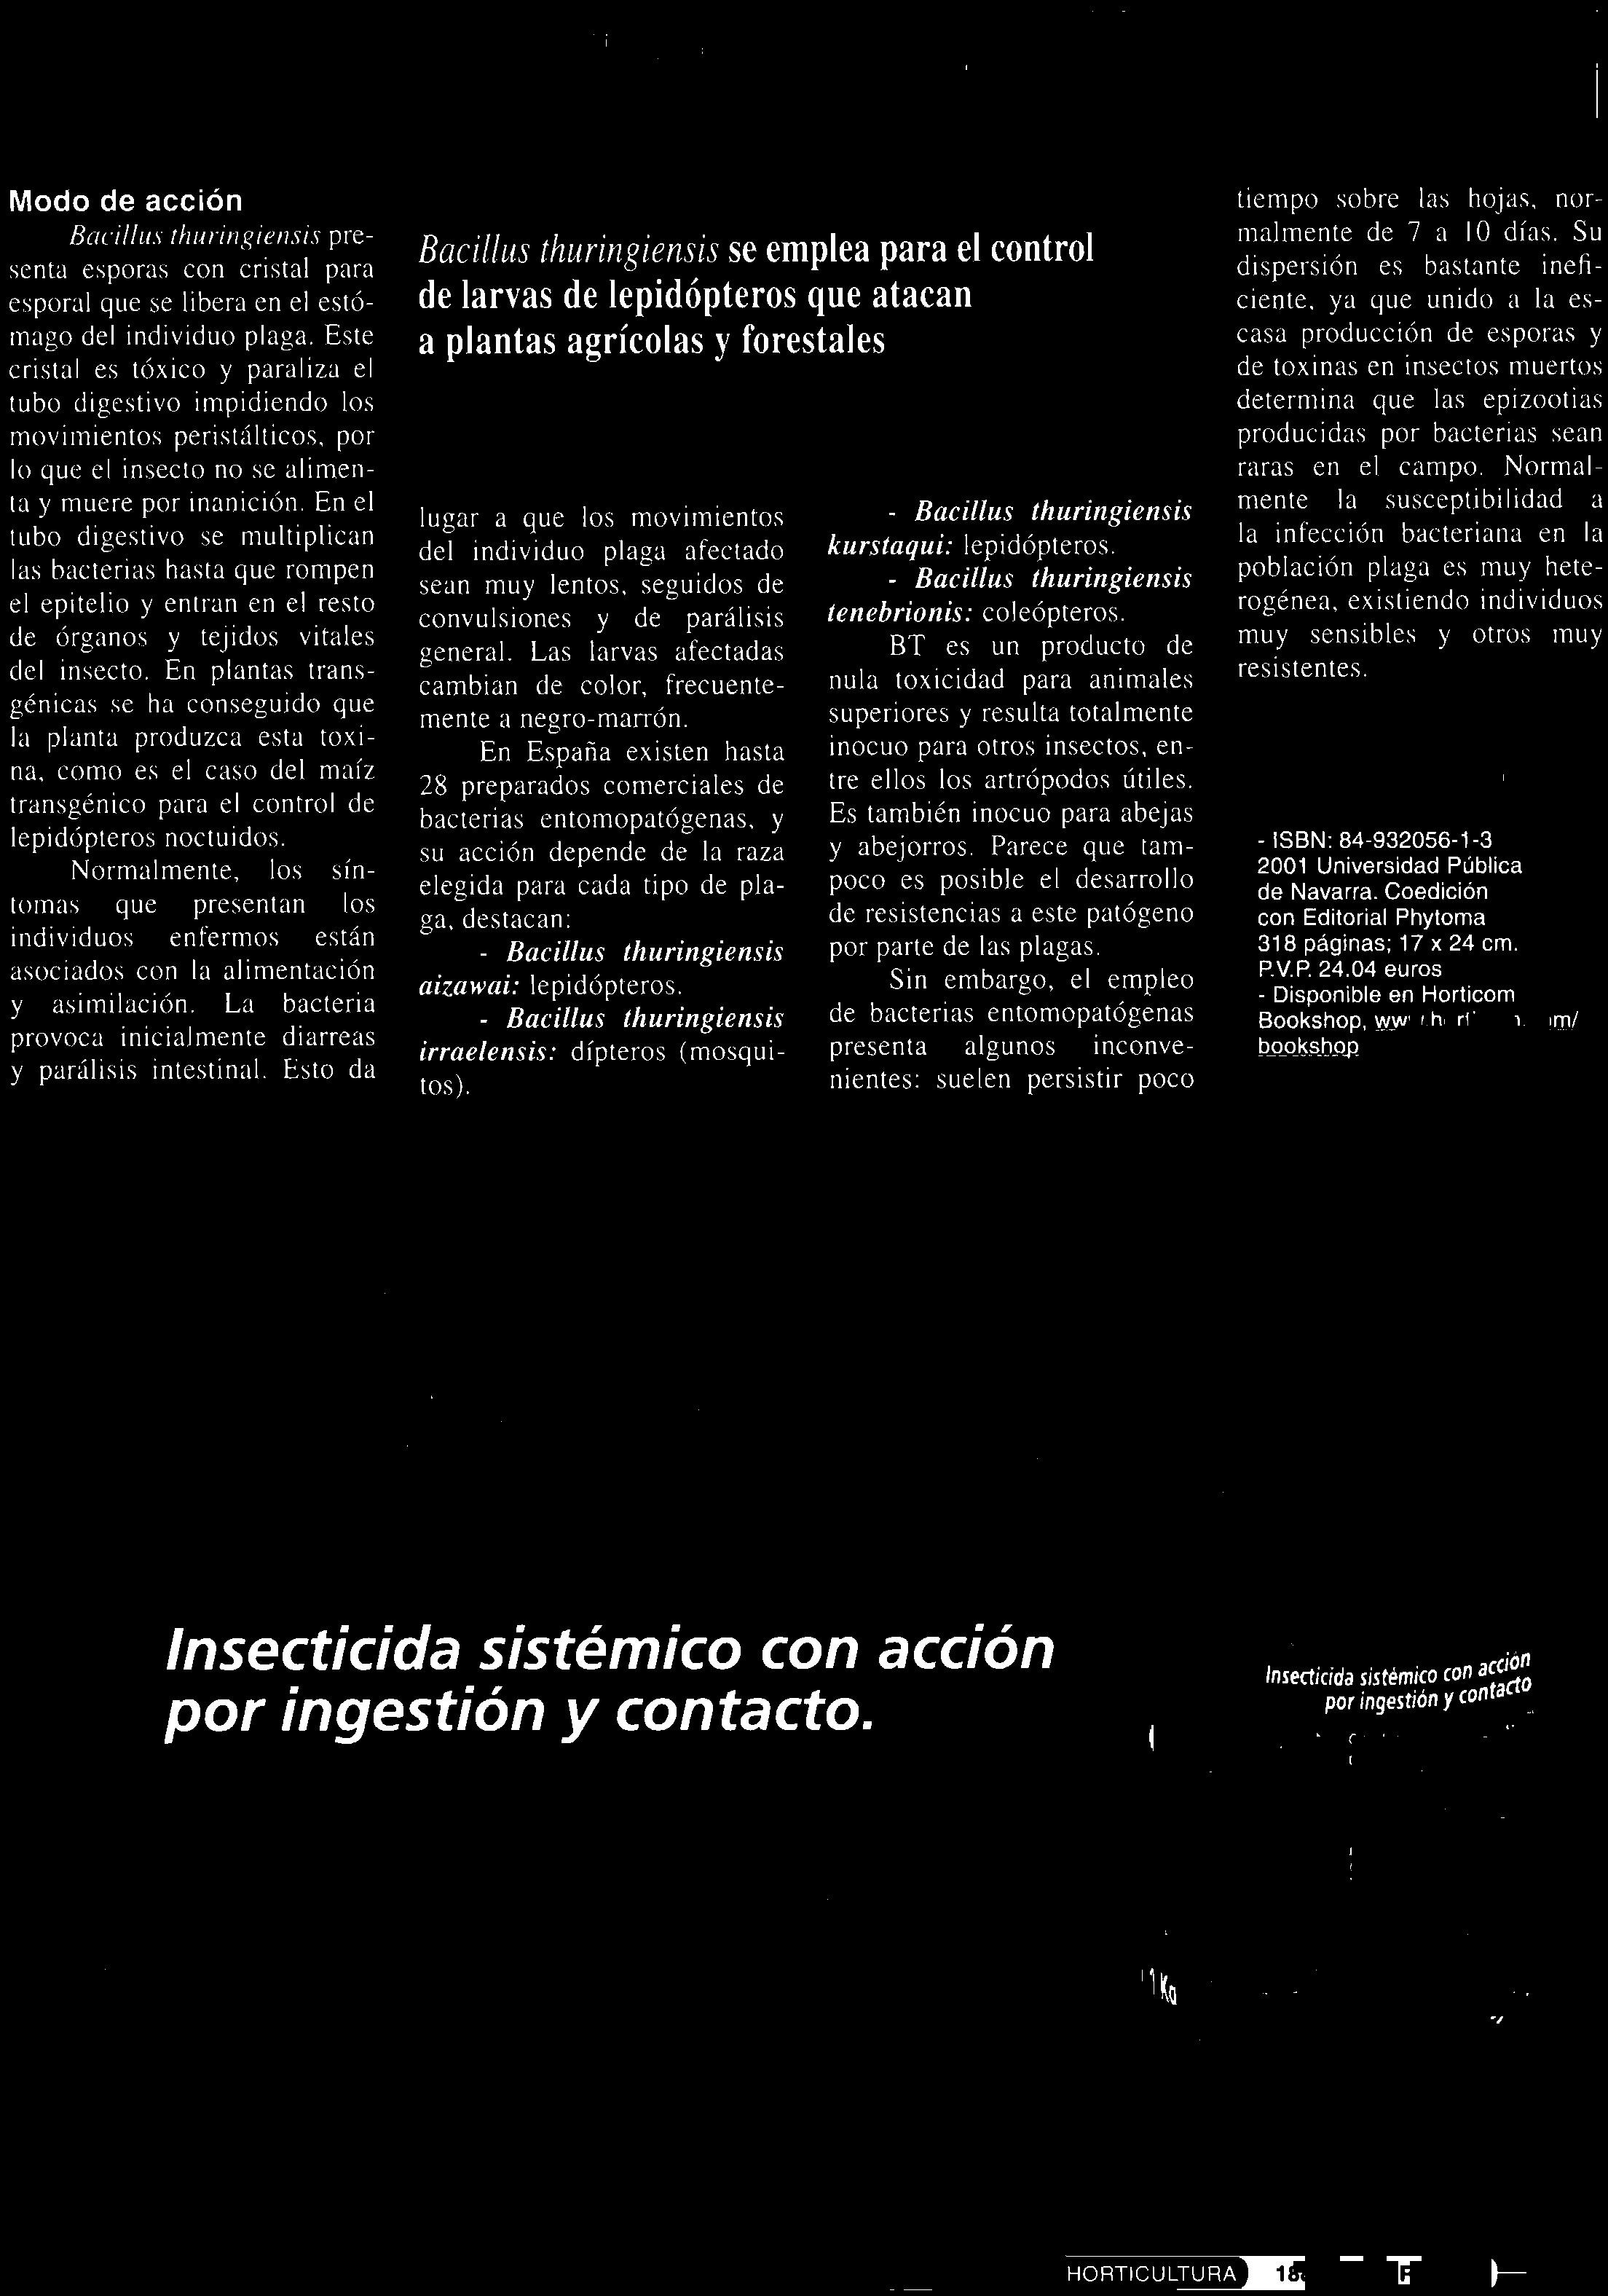 Calendario 2019 Semana Santa España Actual J Jj J R Iiii11i F 7 Pdf Of Calendario 2019 Semana Santa España Actual Information to Users Pdf